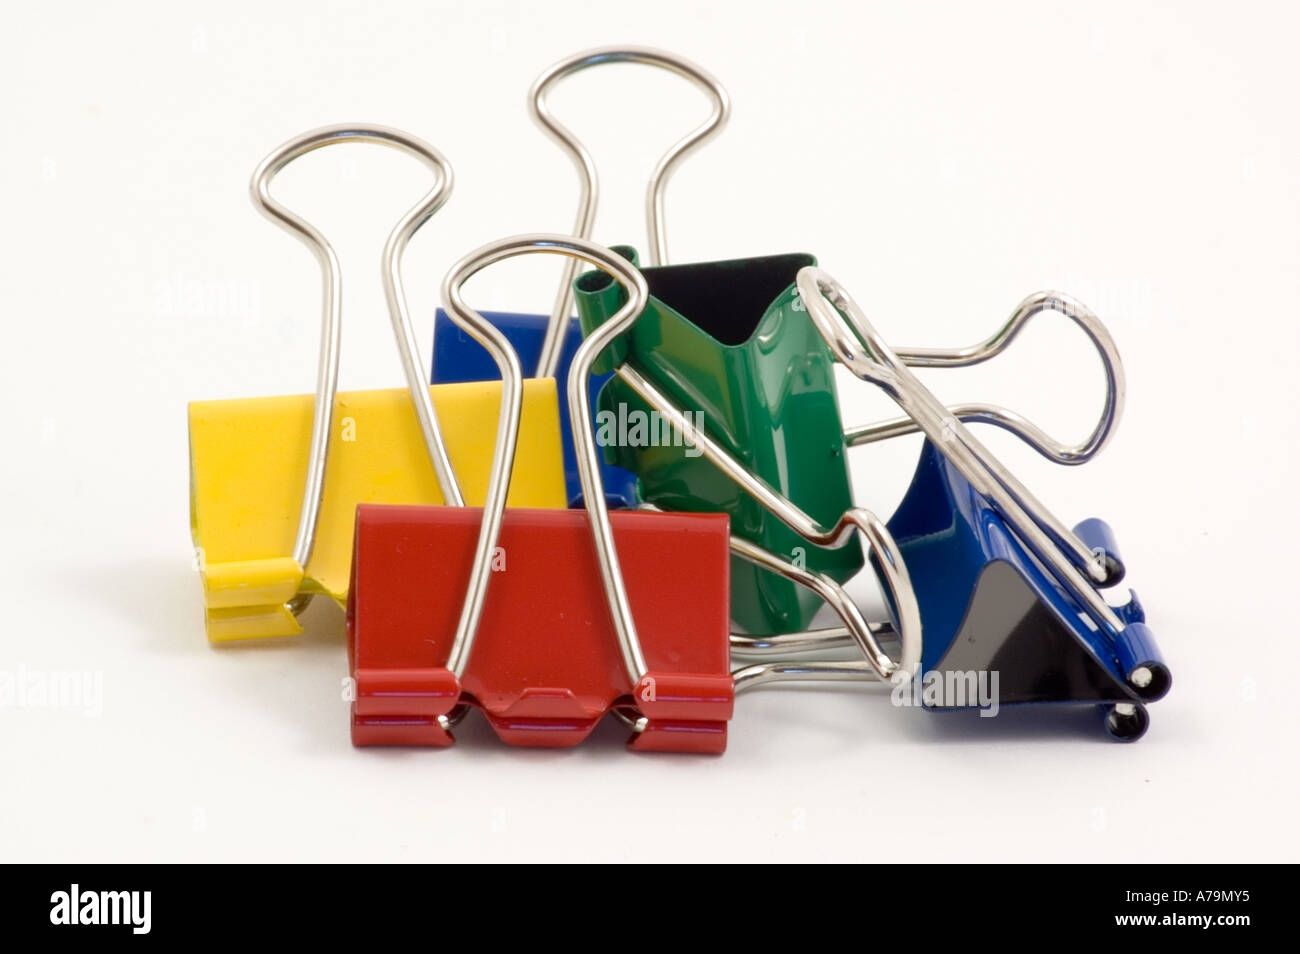 Bulldog clips - Stock Image